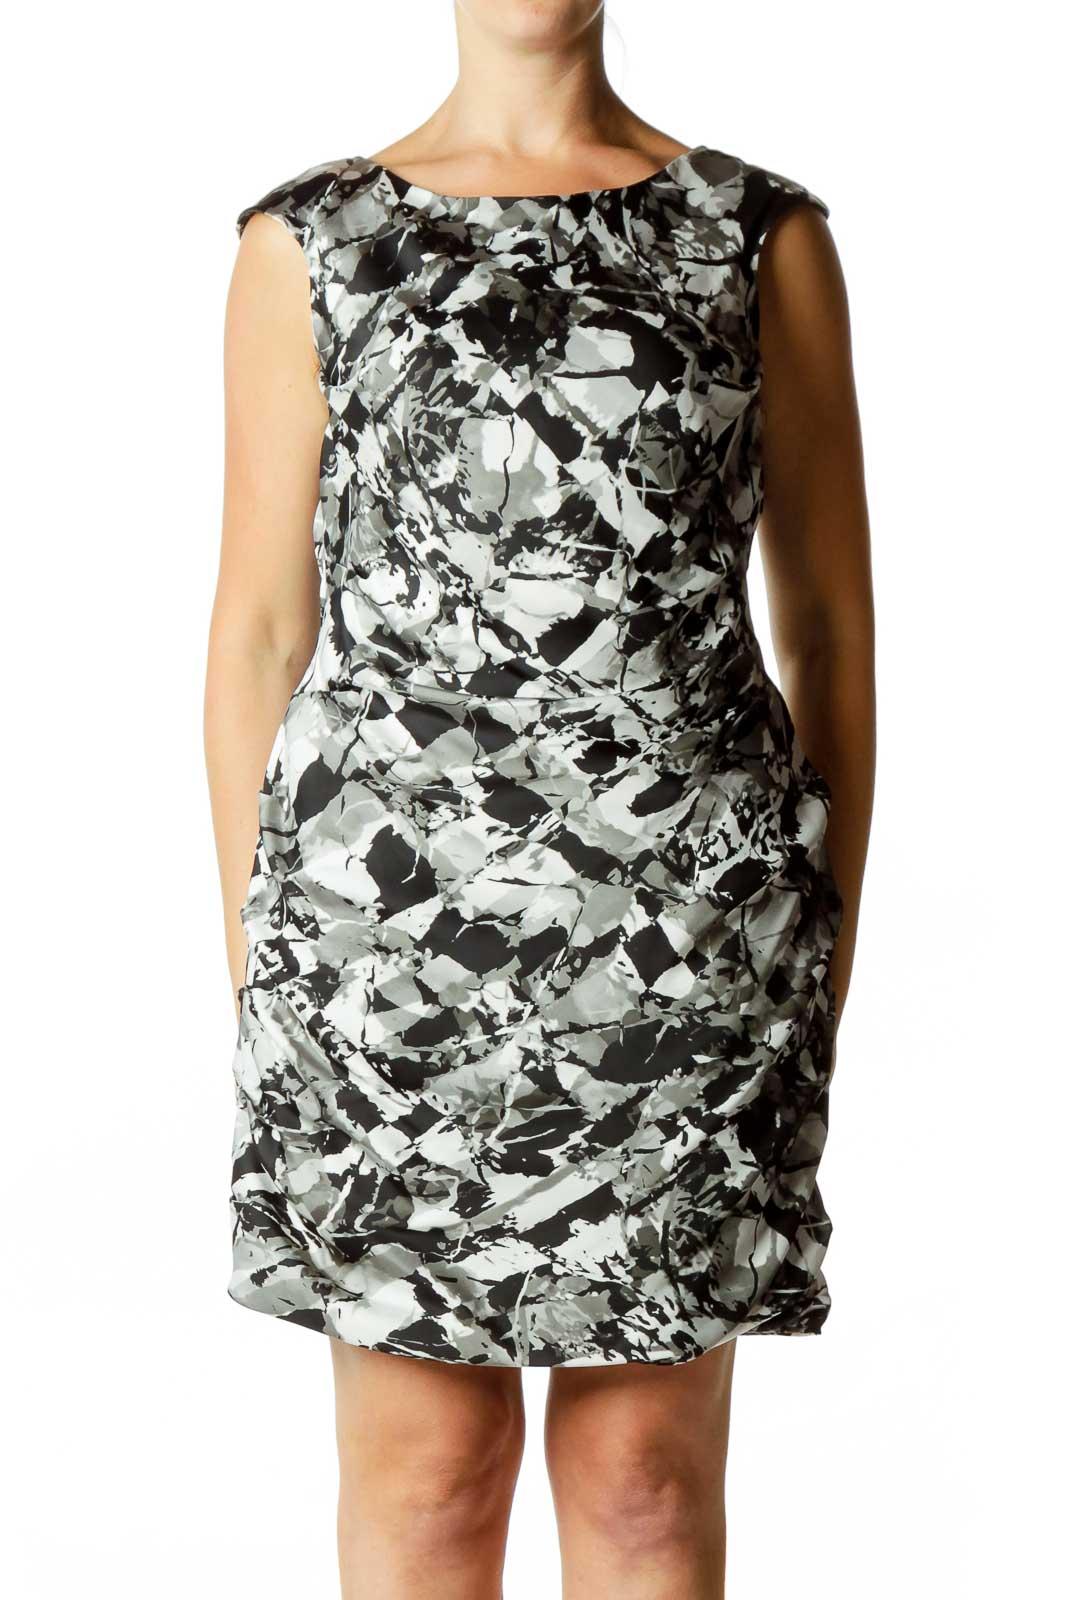 Black & Gray Sleeveless Dress Front